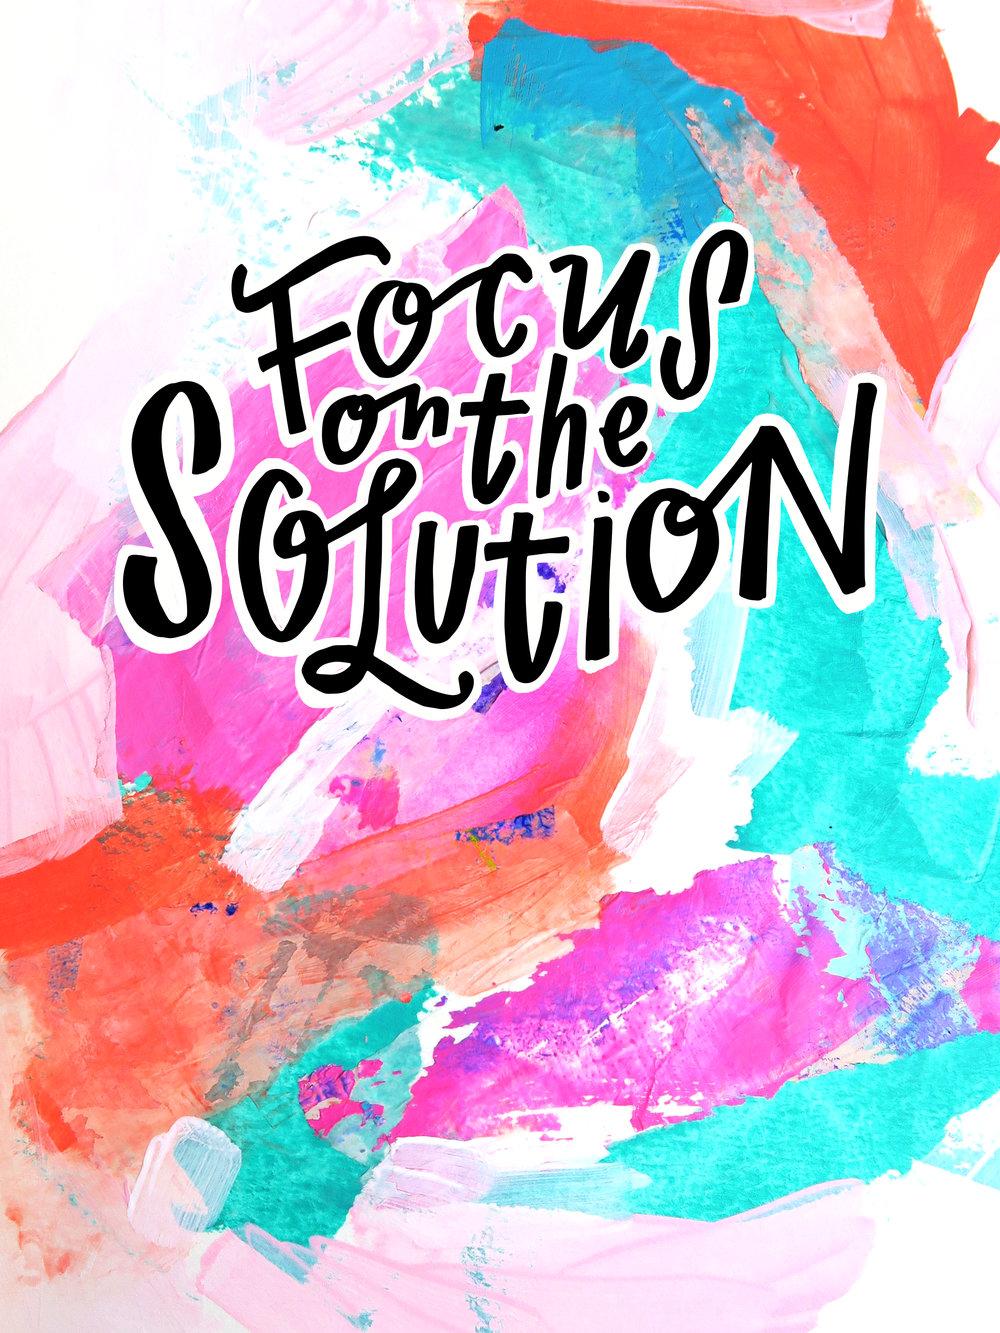 8/2/16: Solution